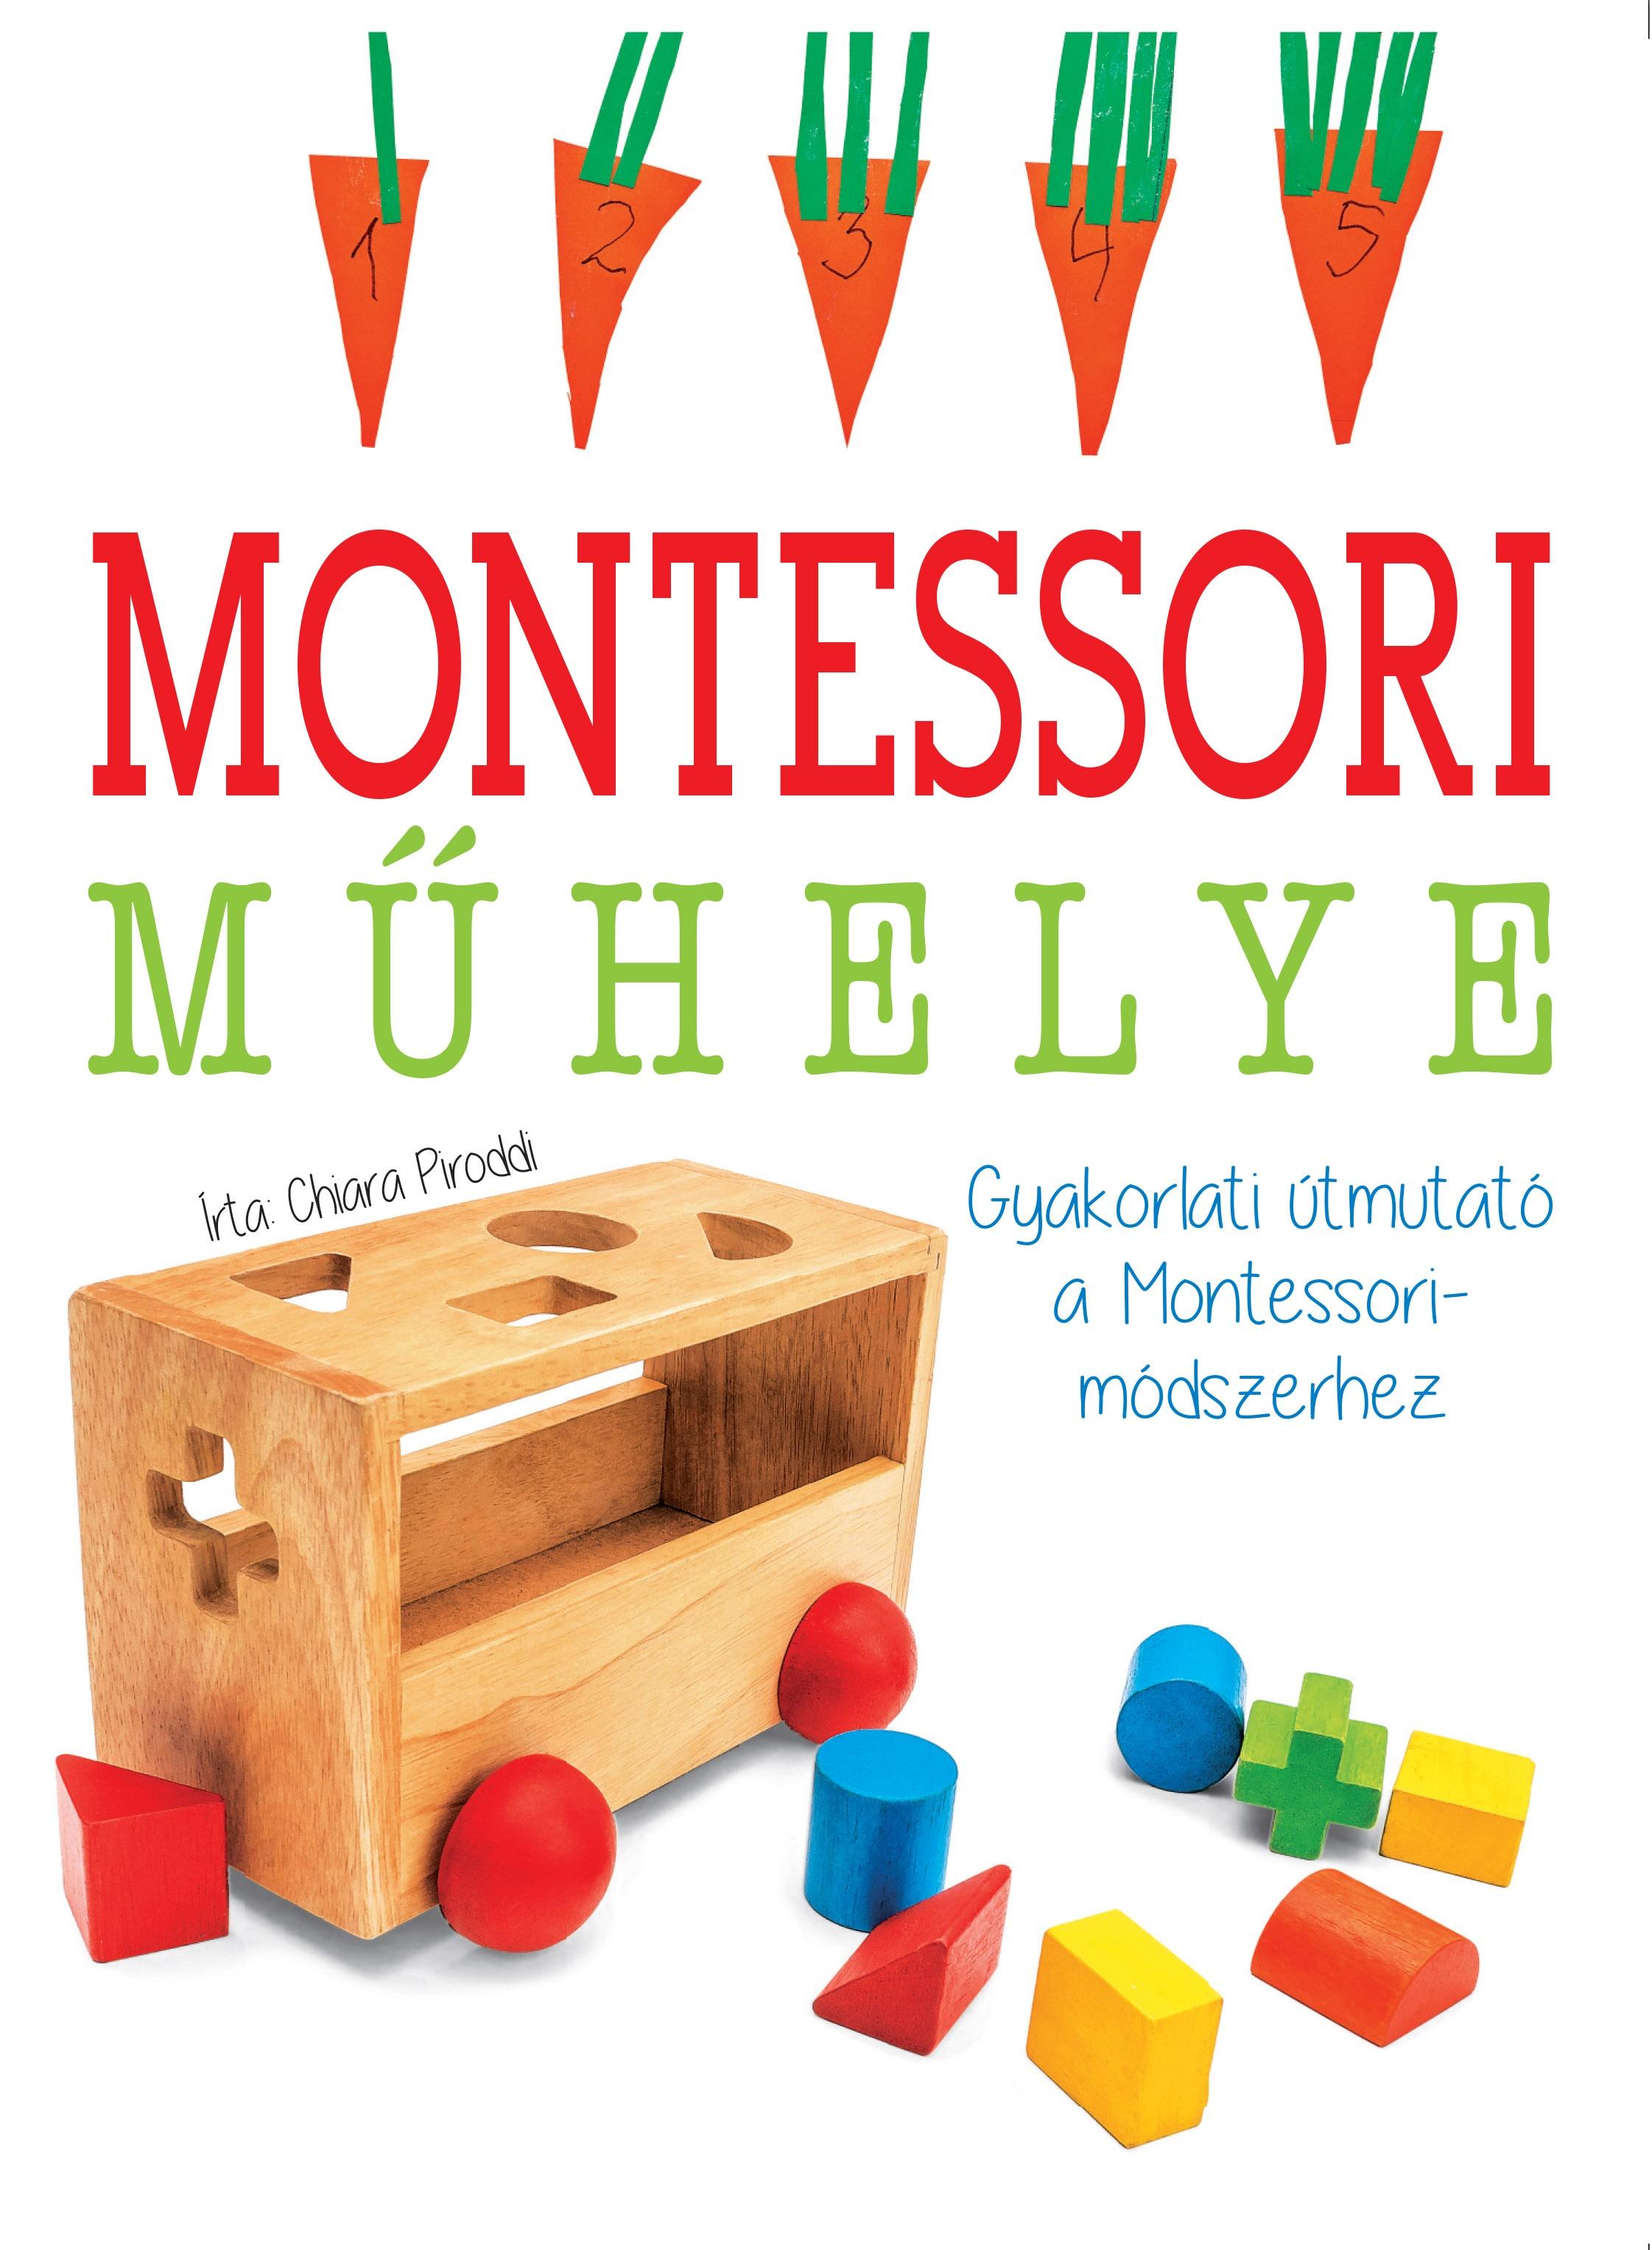 Chiara Piroddi - Montessori műhelye - Gyakorlati útmutató a Montessori-módszerhez